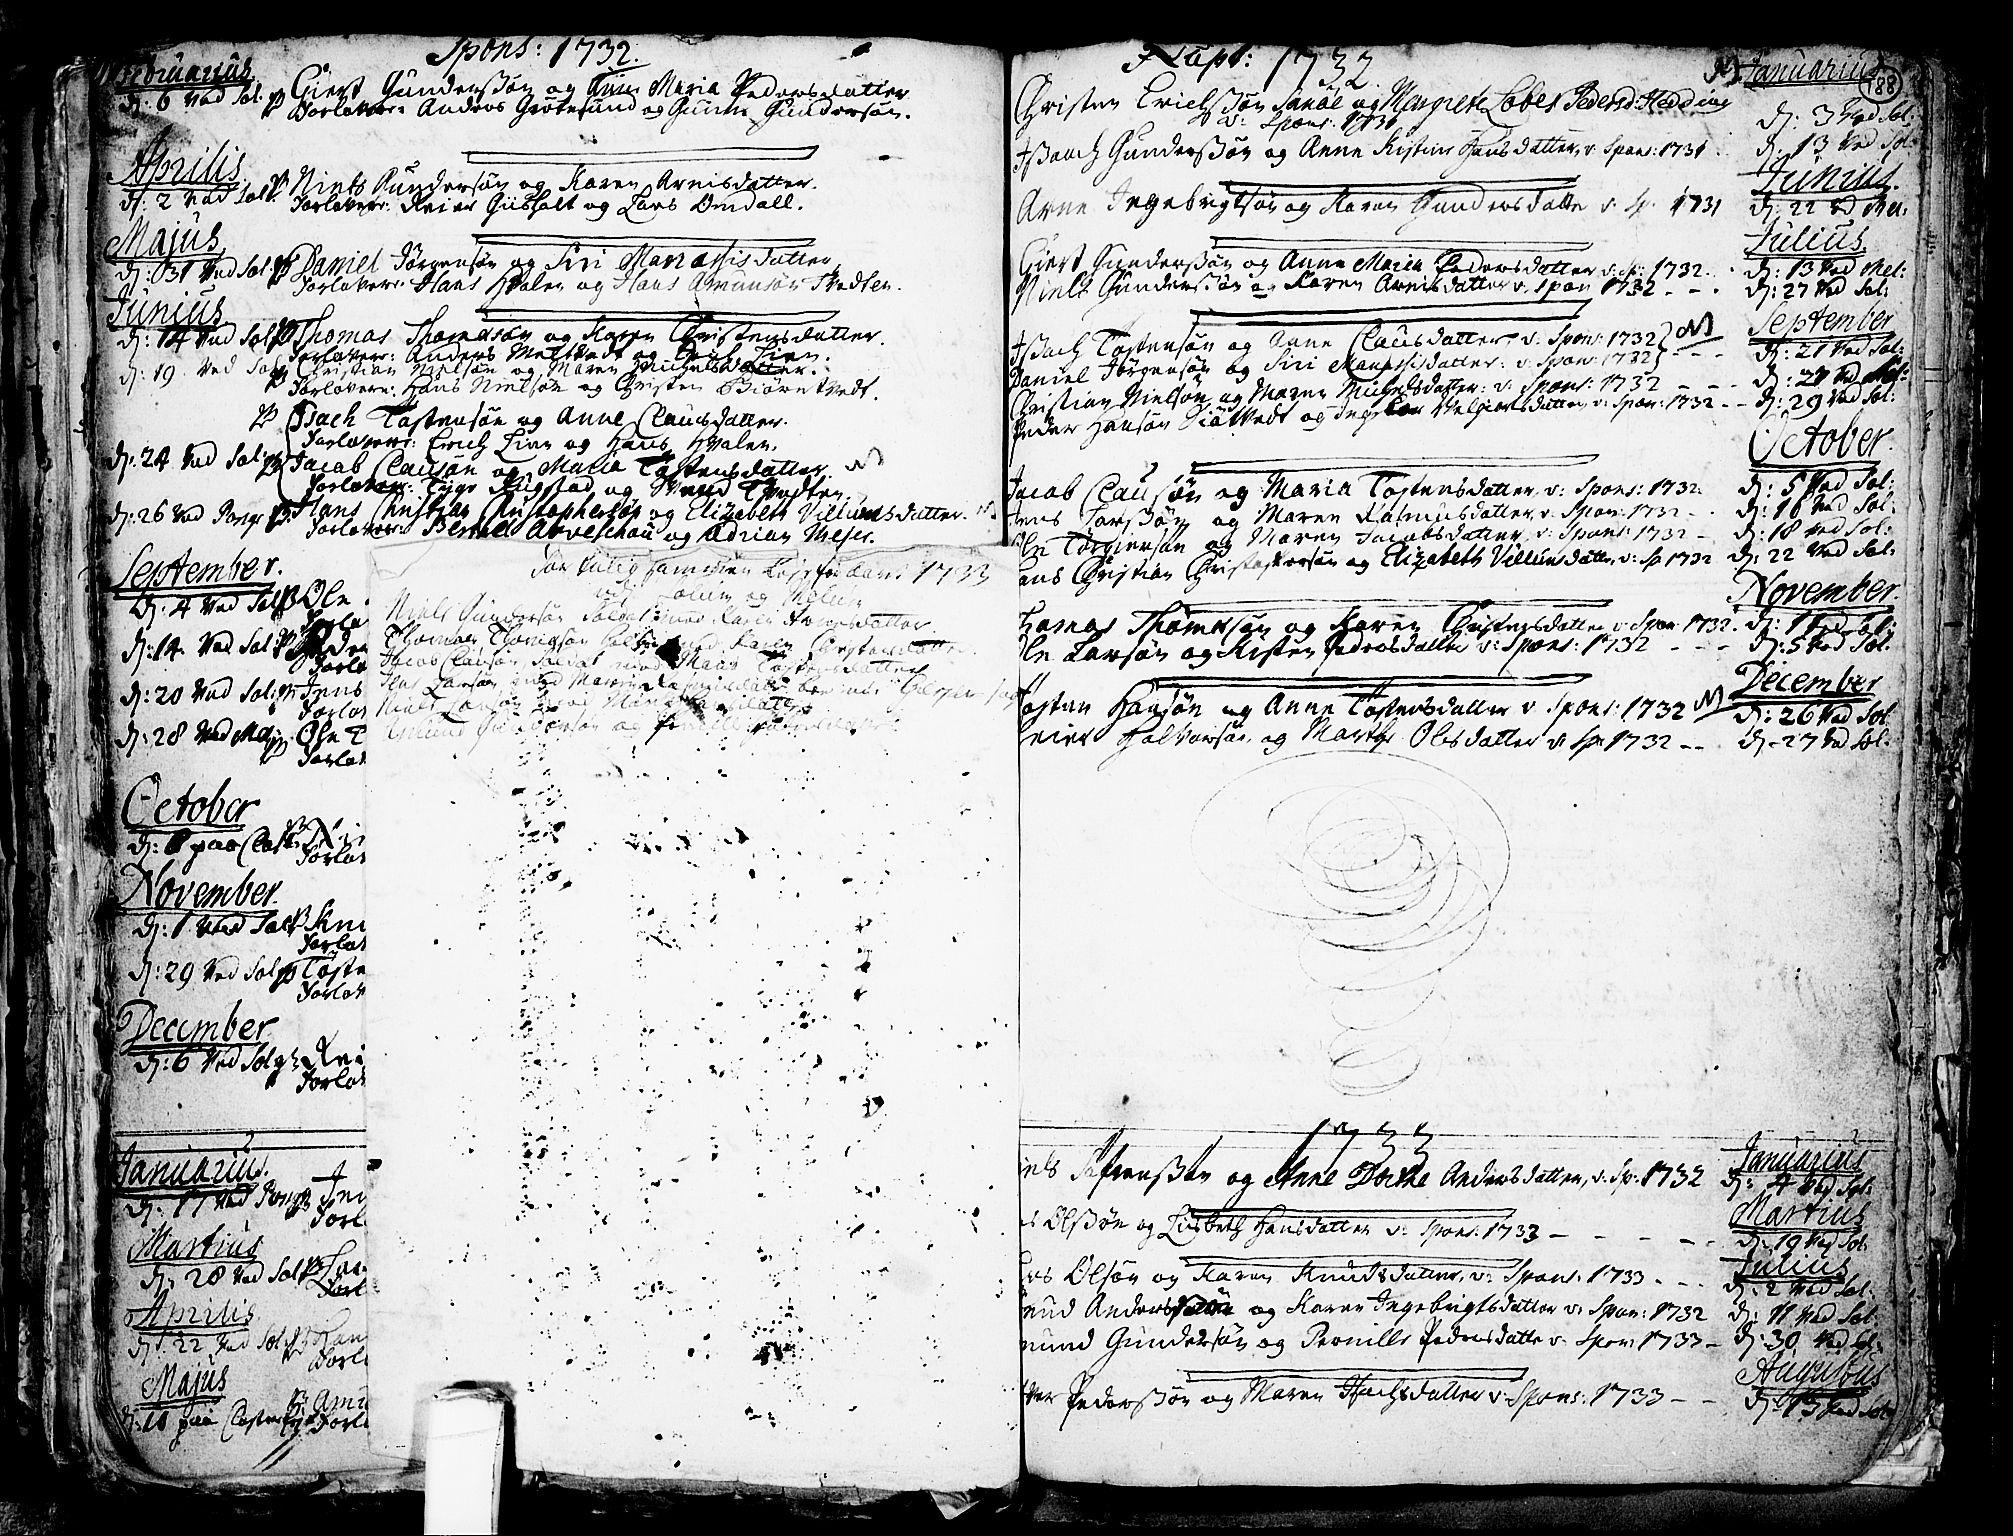 SAKO, Solum kirkebøker, F/Fa/L0002: Ministerialbok nr. I 2, 1713-1761, s. 189